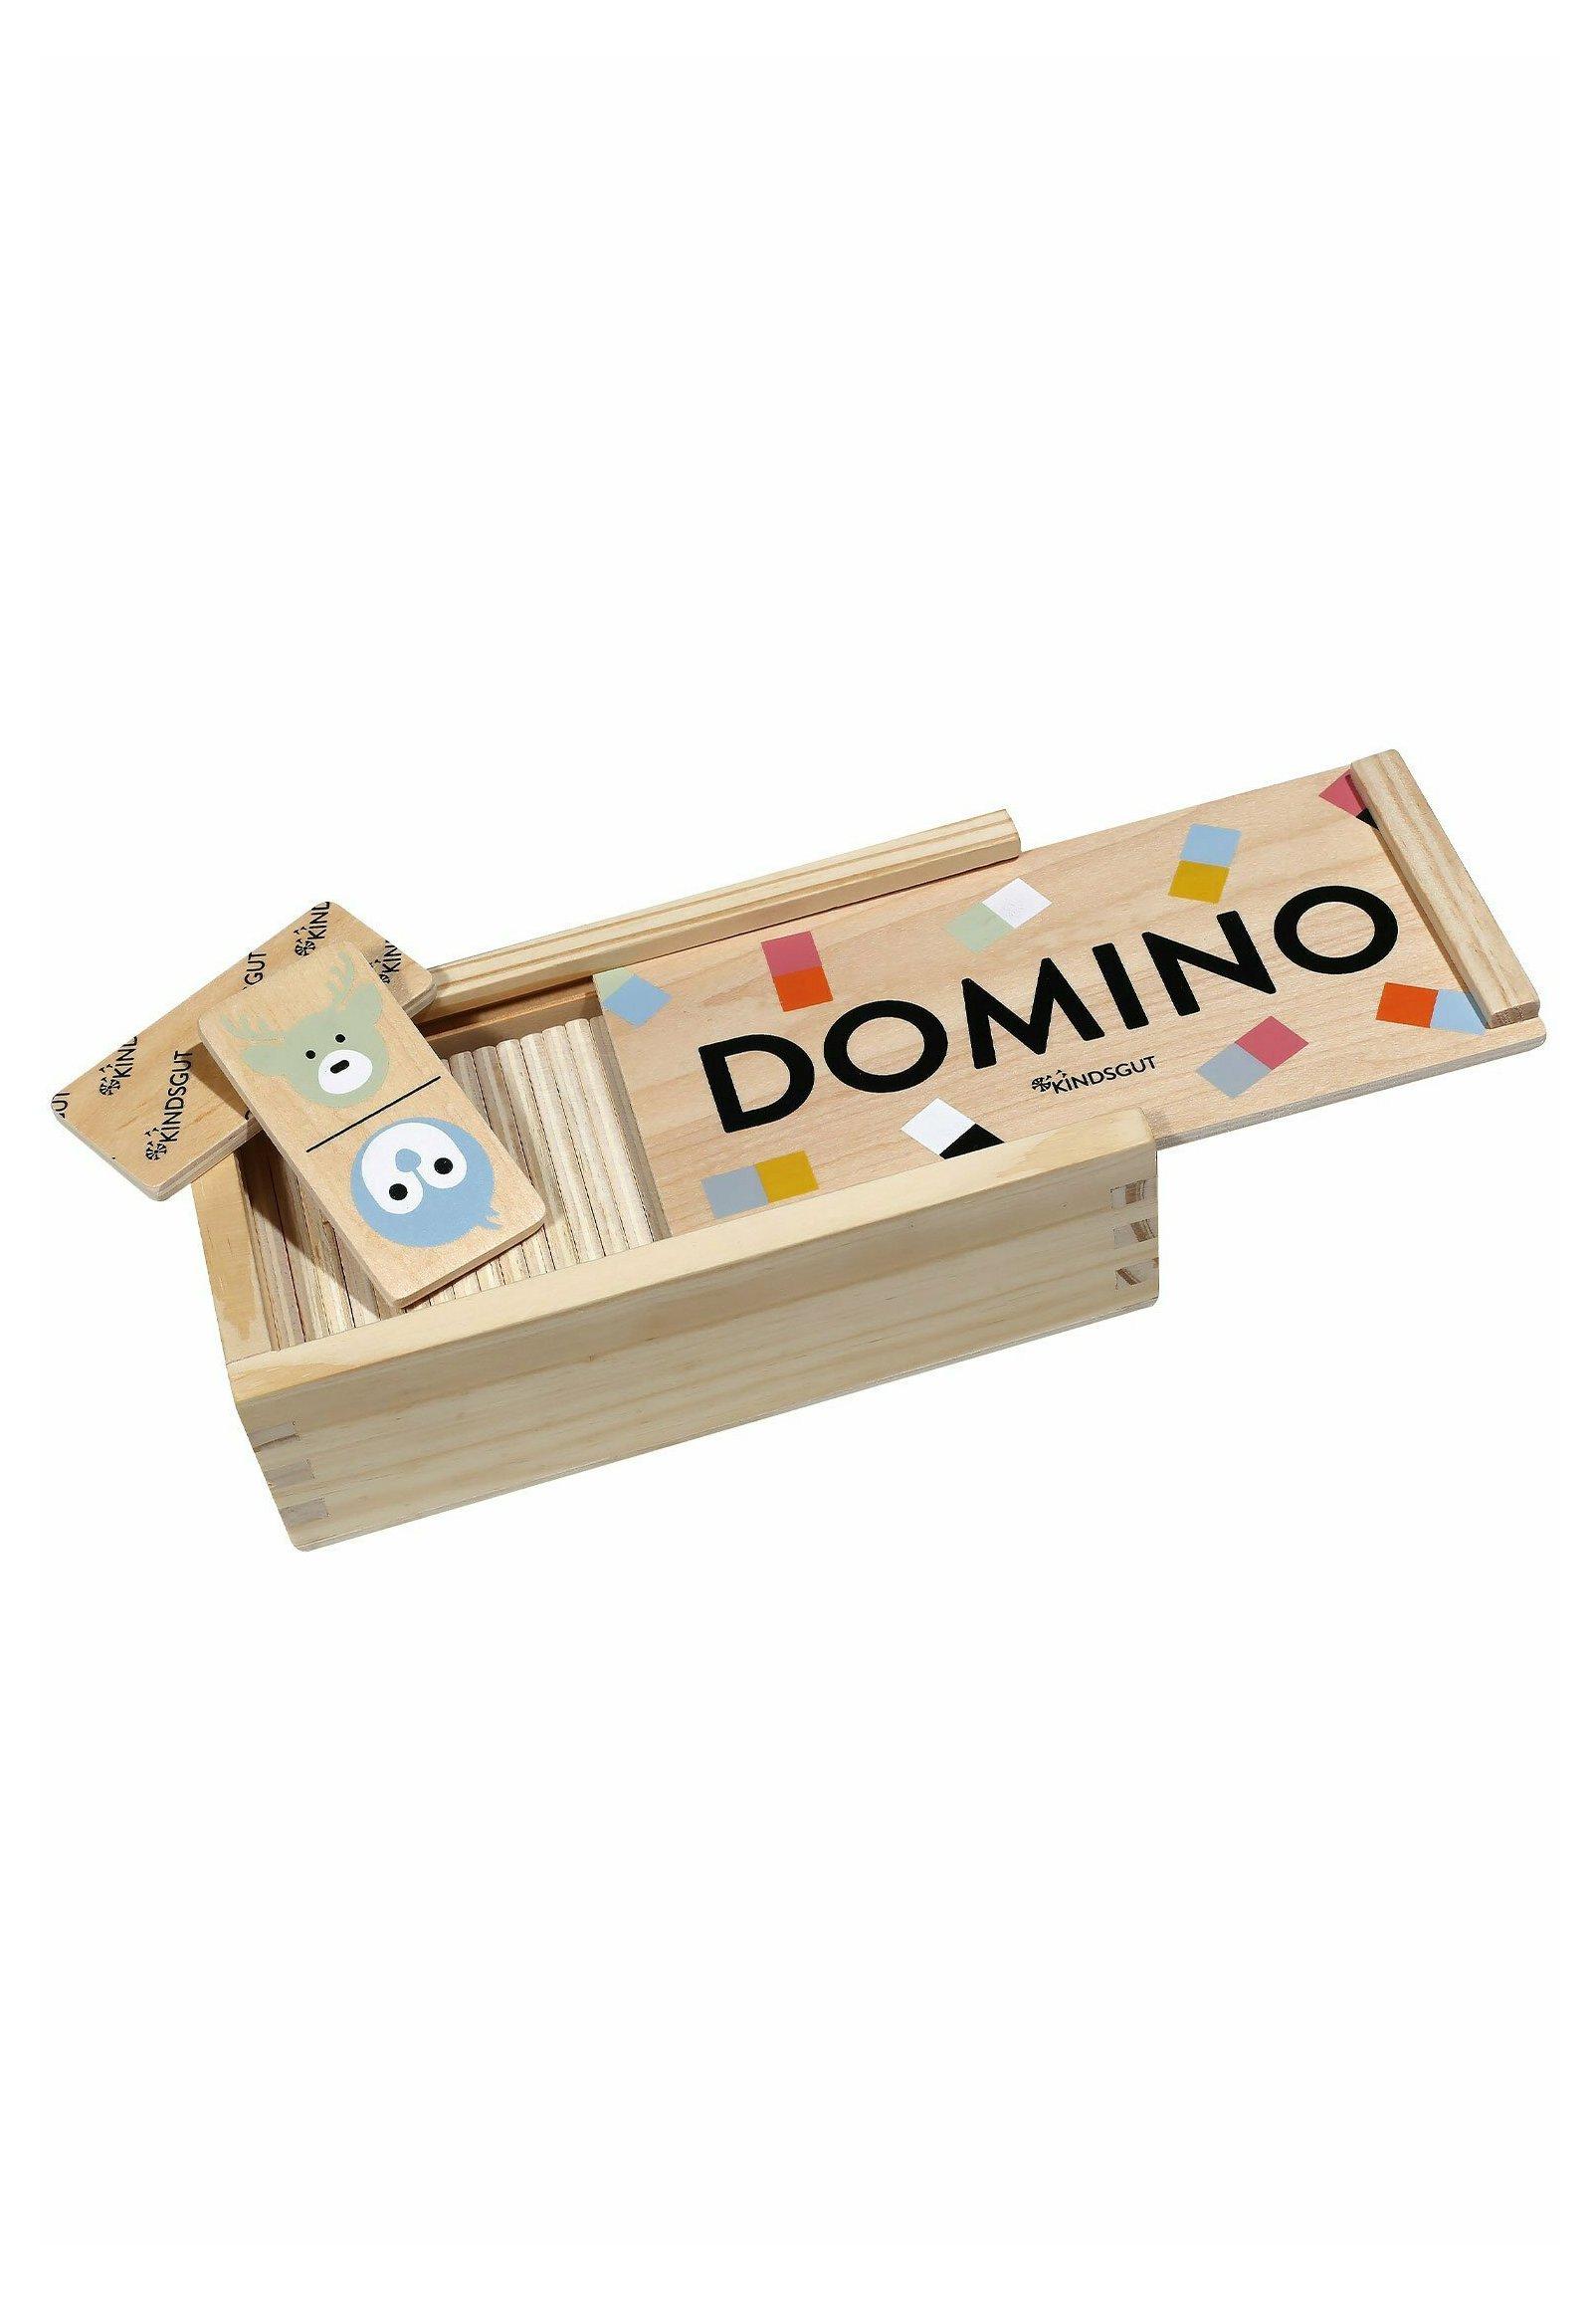 Kinder DOMINO TIERE - Holzspielzeug